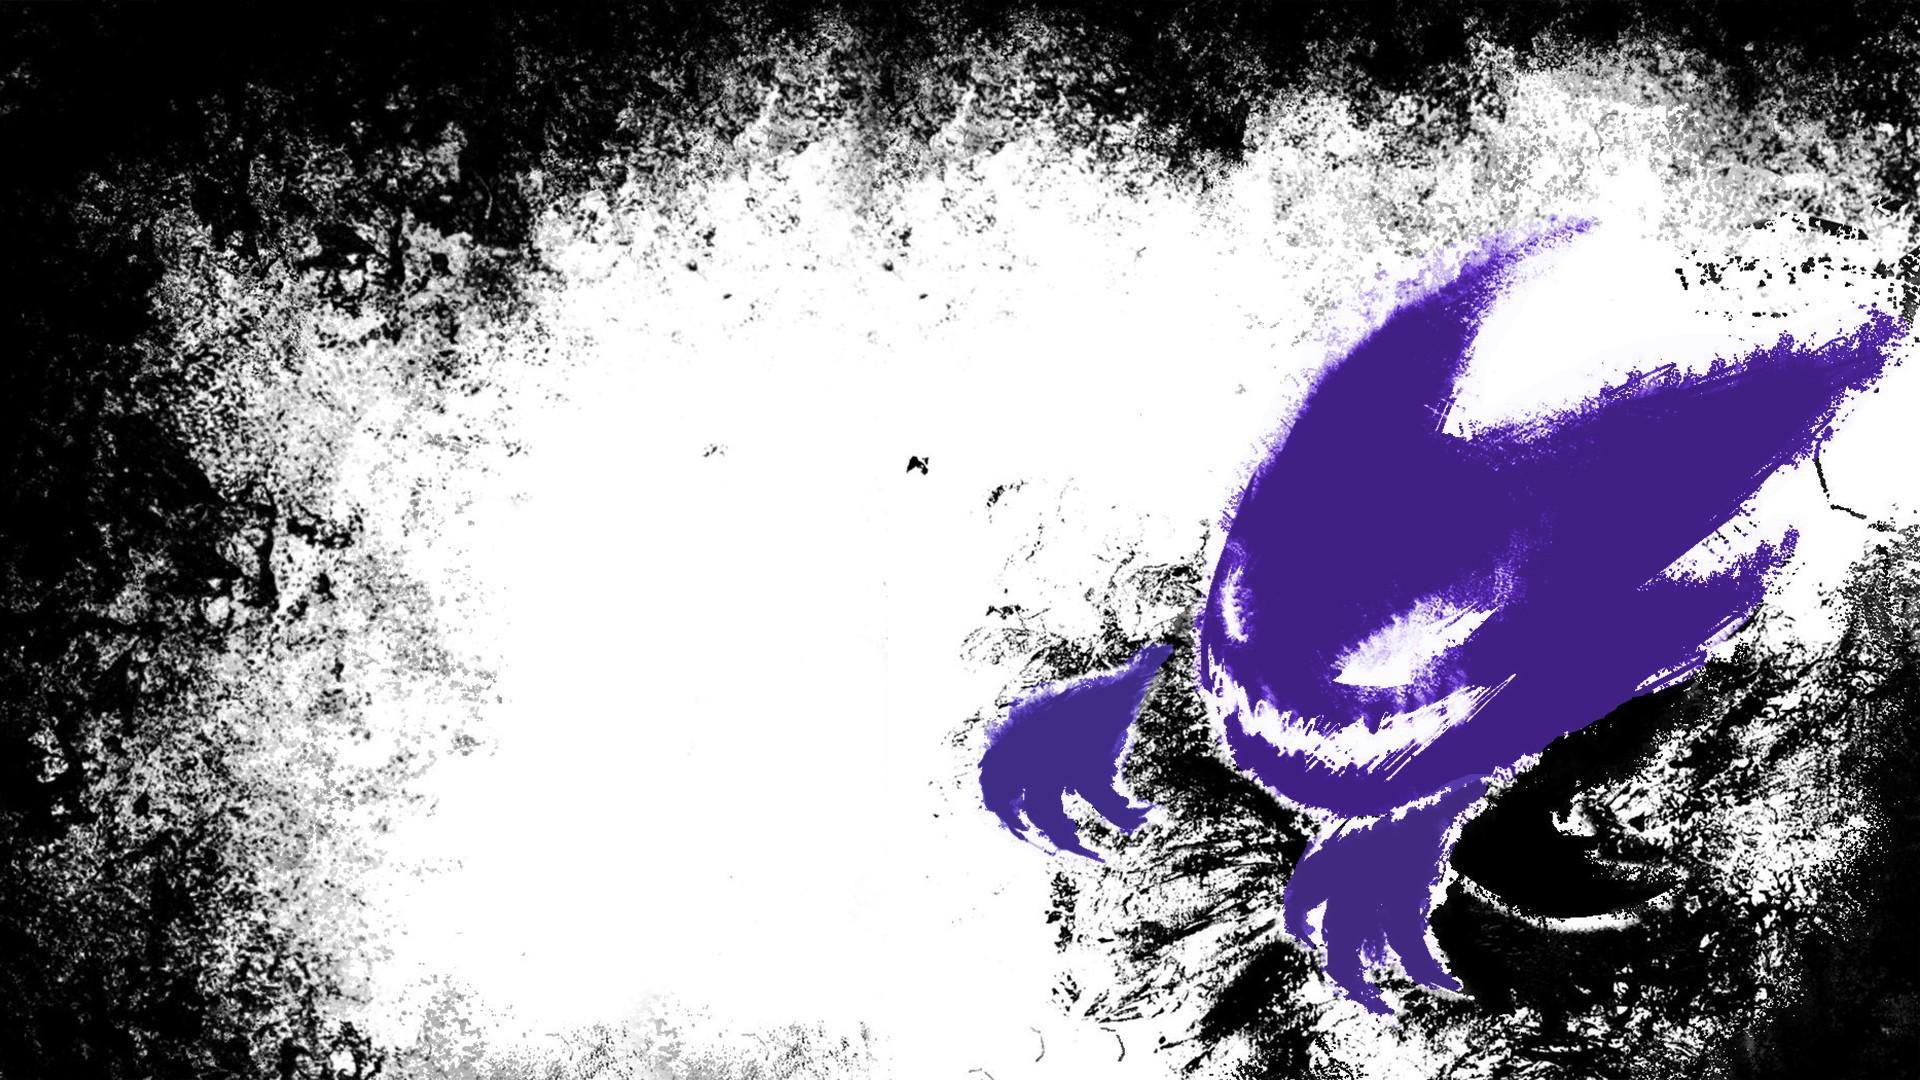 grunge haunter video games nintendo pokemon first generation